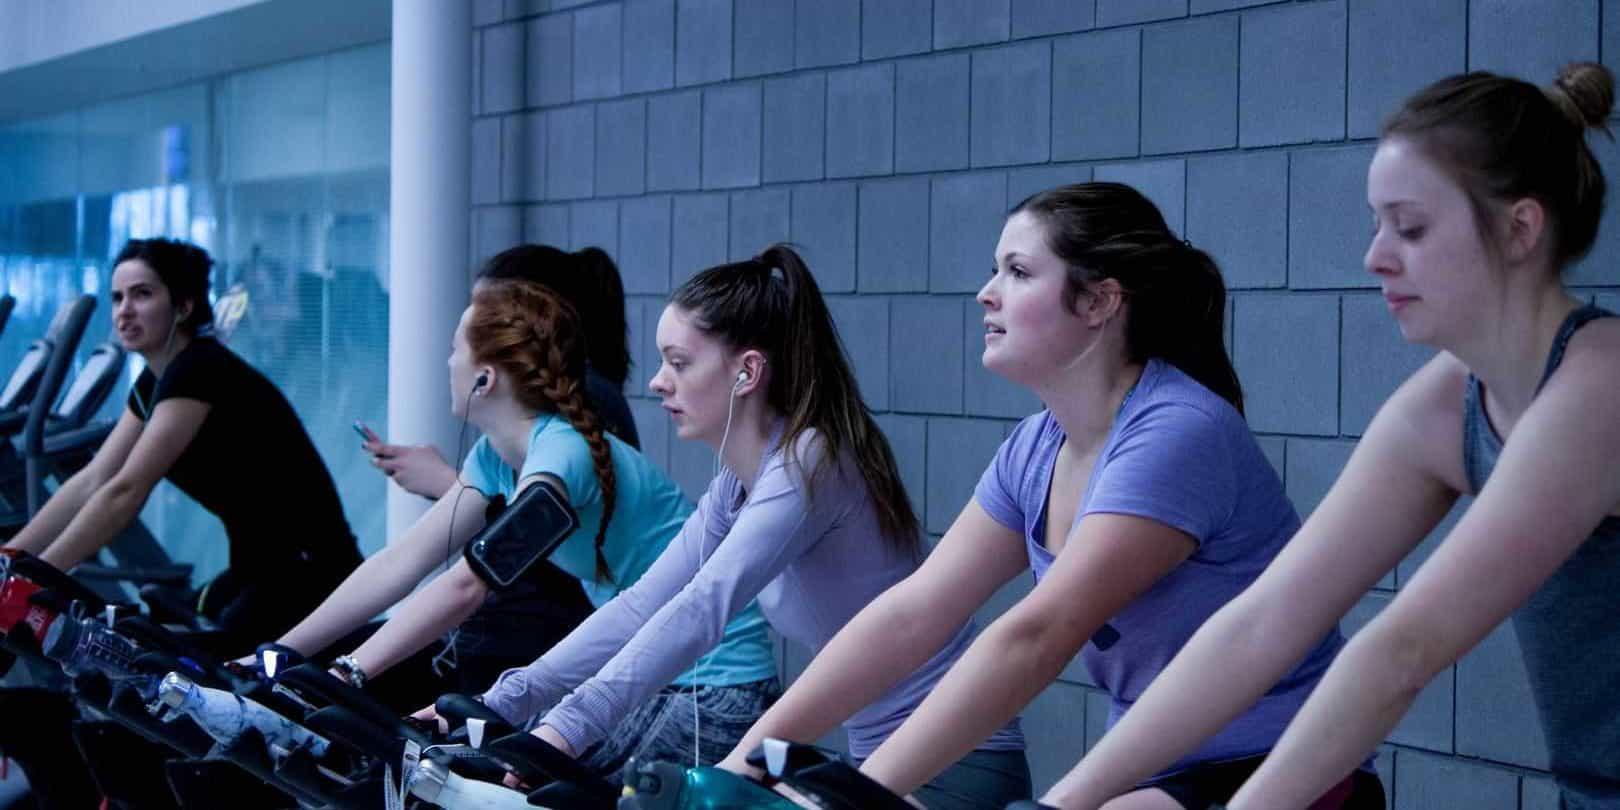 8-minute sprint workout